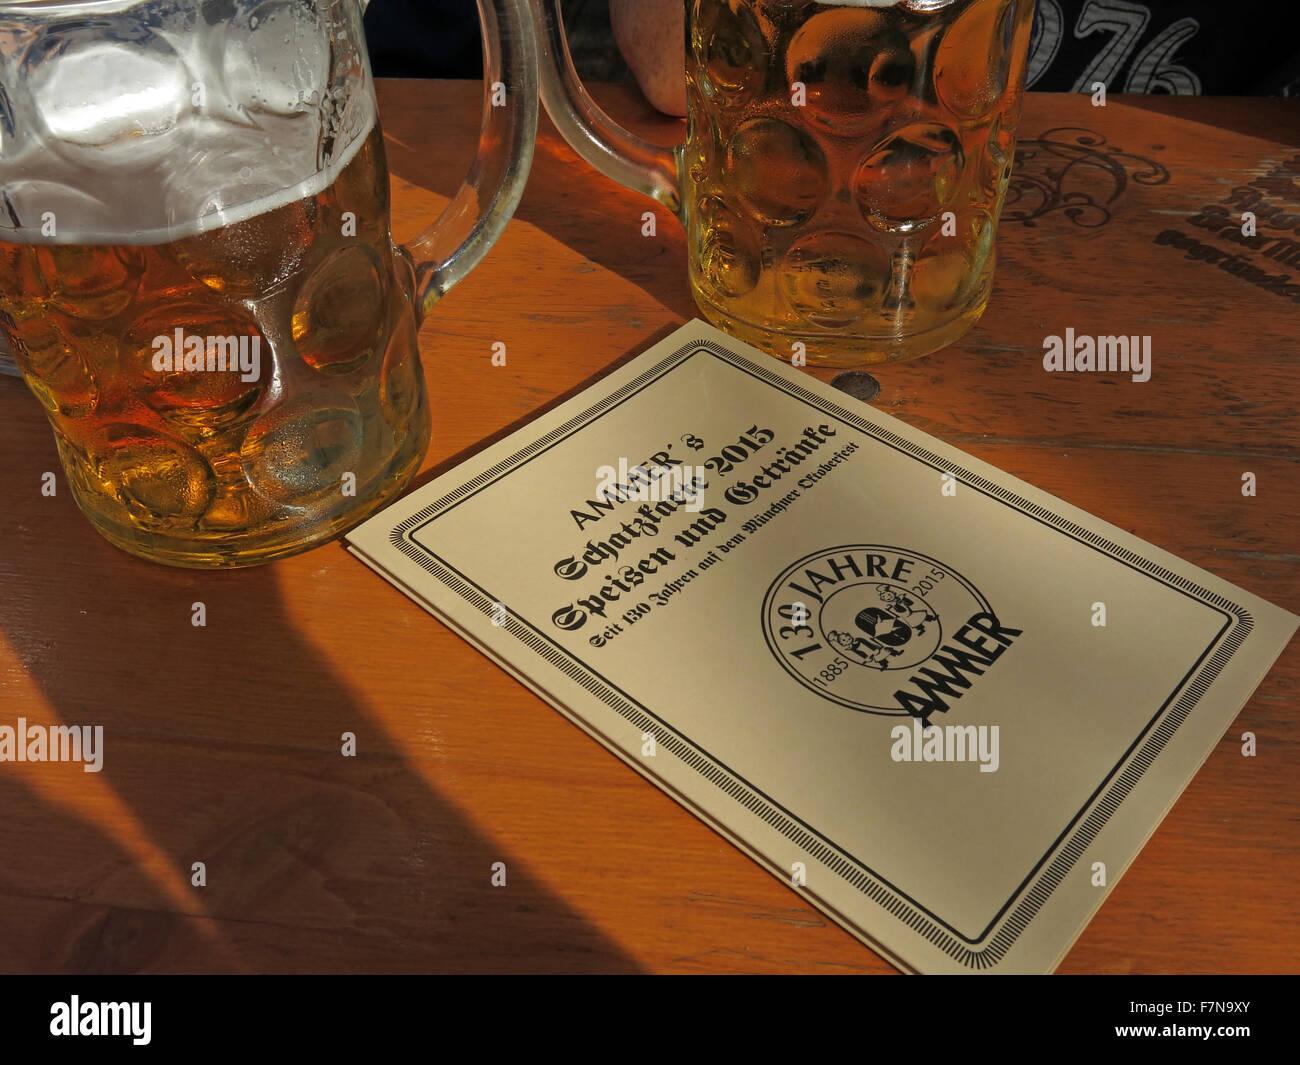 Bavaria,Munich,Germany with liter stein of beer,beir,Octoberfest,wood,wooden,stain,brand,beer,bier,beir,glass,1328,jw,gegrunder 1328,mat,beermat,advertising,alcohol,bar,bars,bavarian,beer,brew,brewery,lager,lagers,pils,liter,litre,surface,Munich,Bavaria,augustiner brau,Gegrunder 1328,GoTonySmith,ale,ammer,autumn,bavaria,beer,beer festival,beer garden,bier,blaukraut,bread,brezen,bright,building,buildings,buy images of,buy pictures of,center,centre,chicken,dirndl,dumplings,enjoyment,event,fairgrounds,festival,field,fun,funfair,garden,garten,germany,gotonysmith,happy,in,kndel,ksesptzle,lederhosen,meadow,munchen,munich,munich octoberfest,munich oktoberfest,october,octoberfest,oktoberfest,oktoberfest beer,pancake,pork,potato,pretzels,reiberdatschi,roast,rotkohl,sauerkraut,scenes,sennerhut,sunny,table,tables,tent,therese,theresienwiese,ticket,tickets,tourism,tourist,tourists,tradition,traditional,travelling,tree,trees,unity day,volksfest,wiesn,Buy Pictures of,Buy Images Of